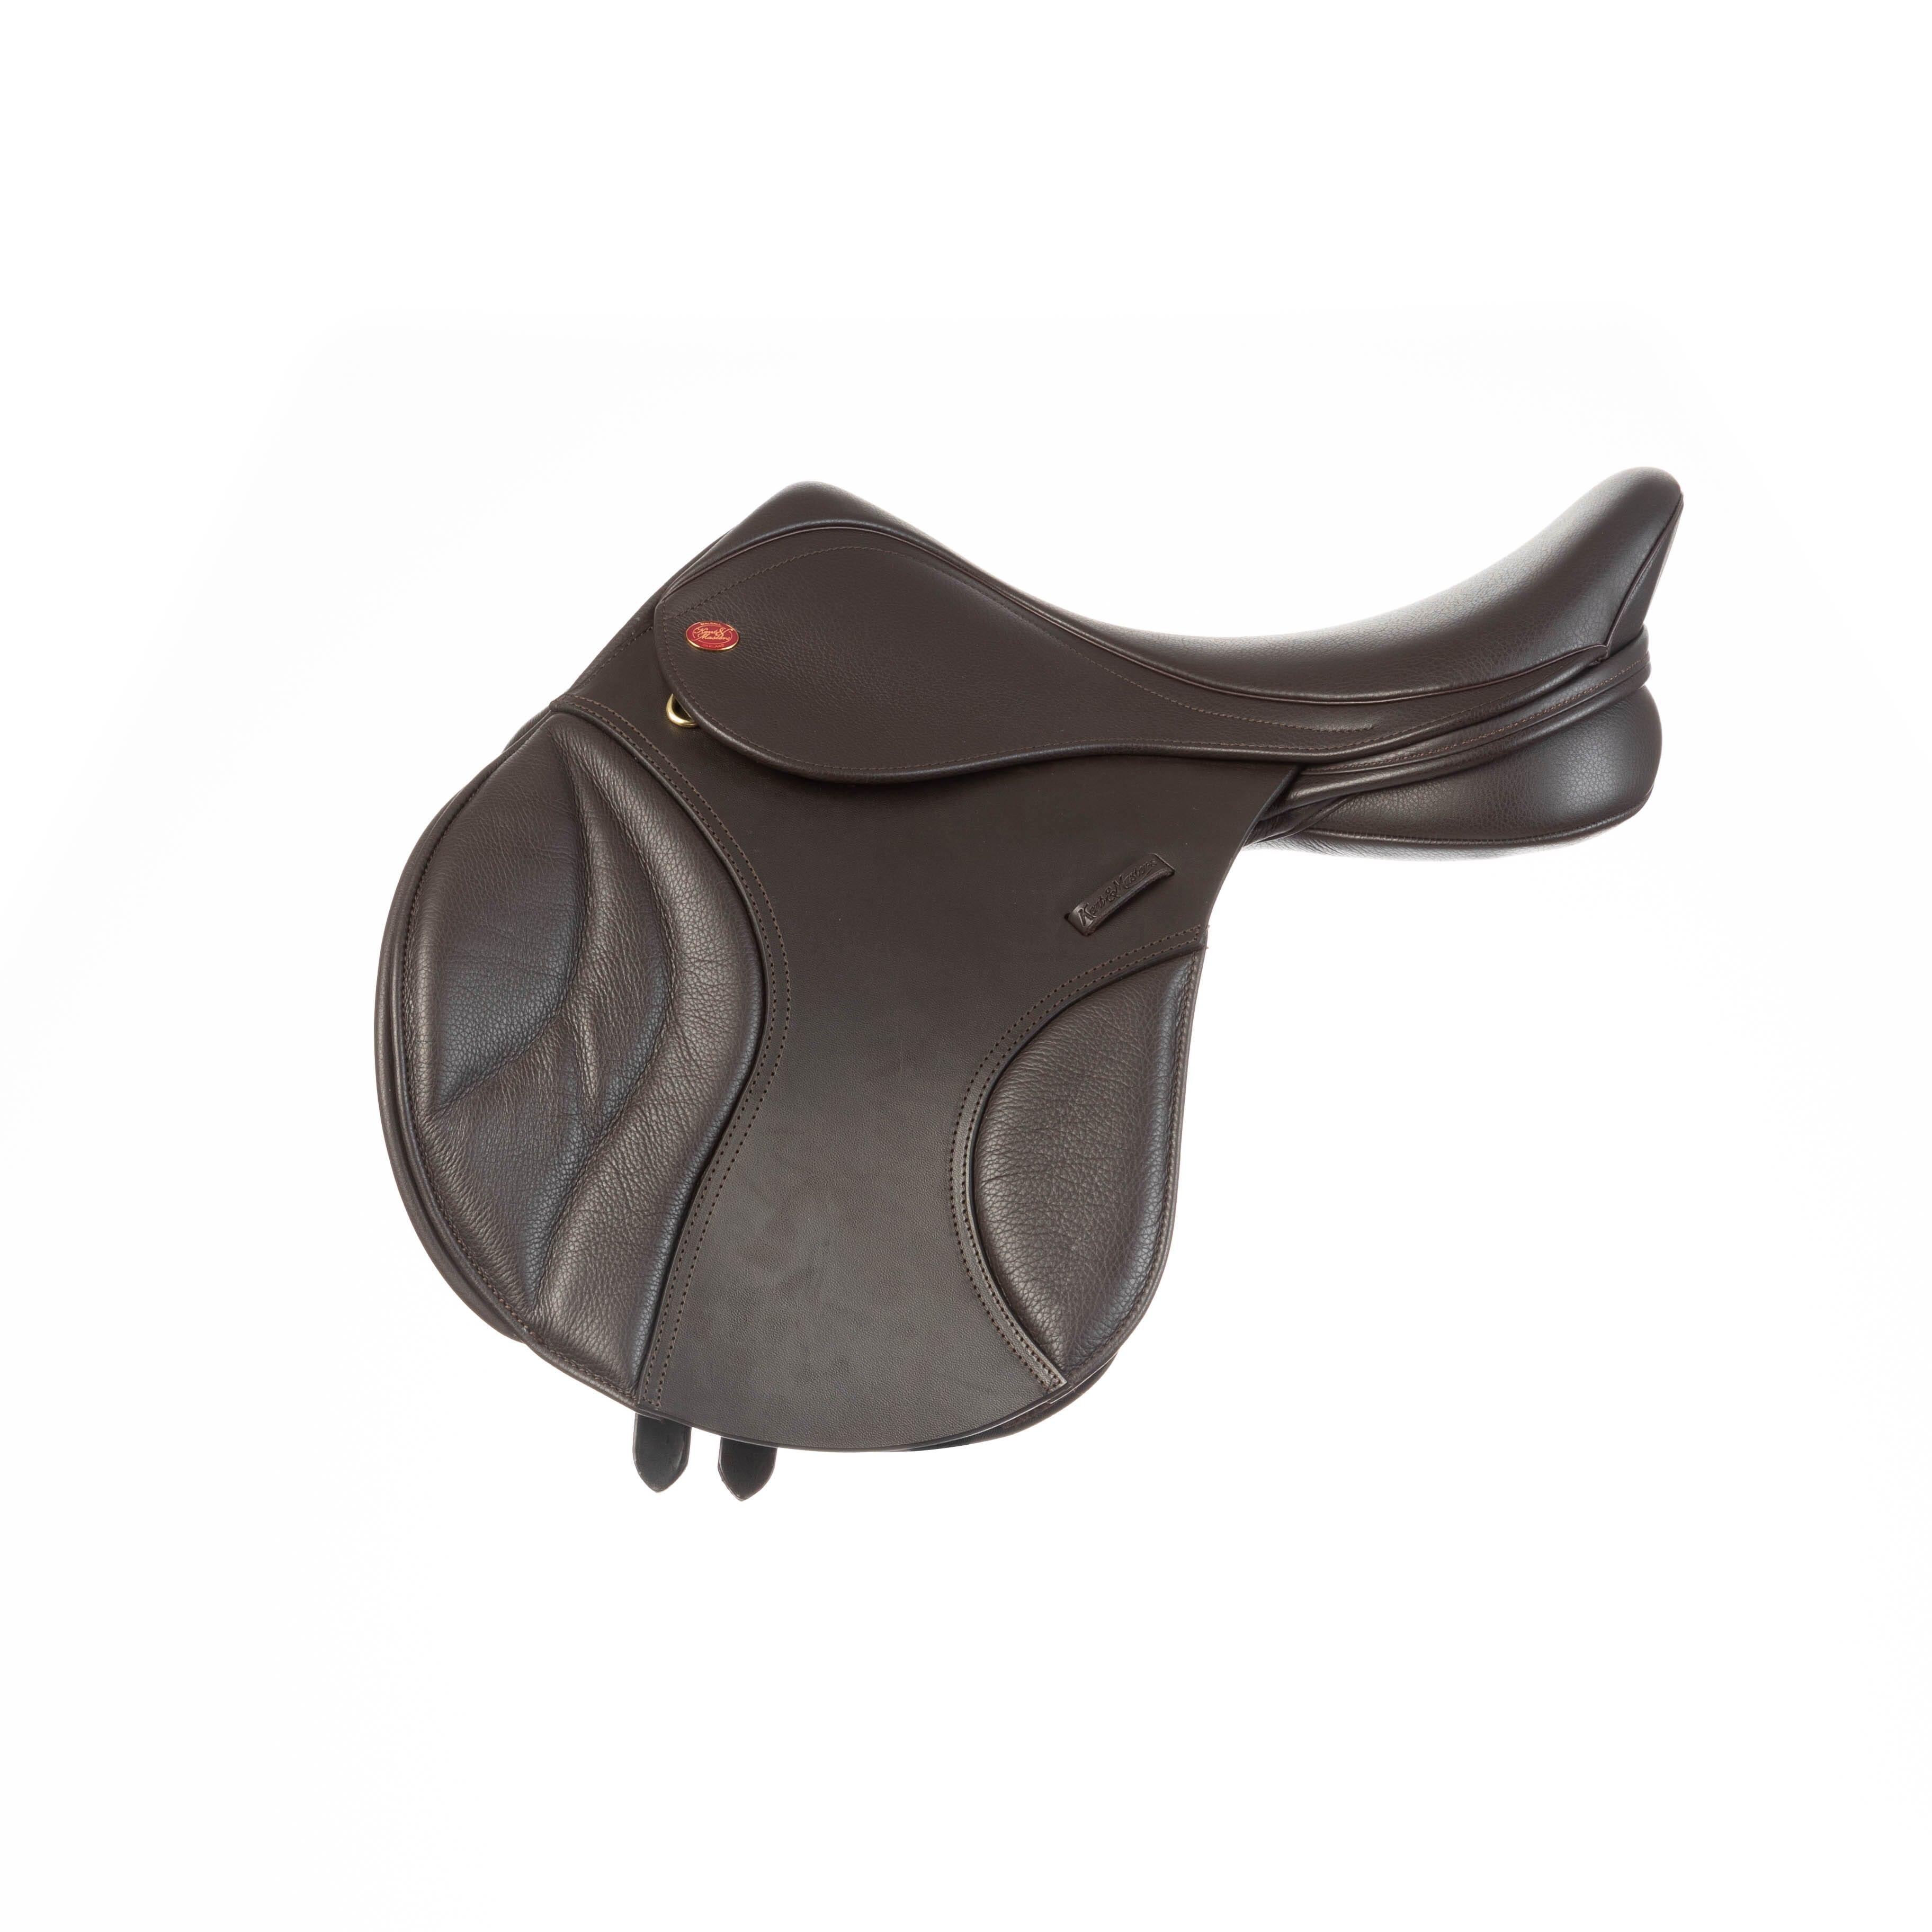 Kent /& Masters Jumping Saddle Leather Knee Blocks Black Or Brown